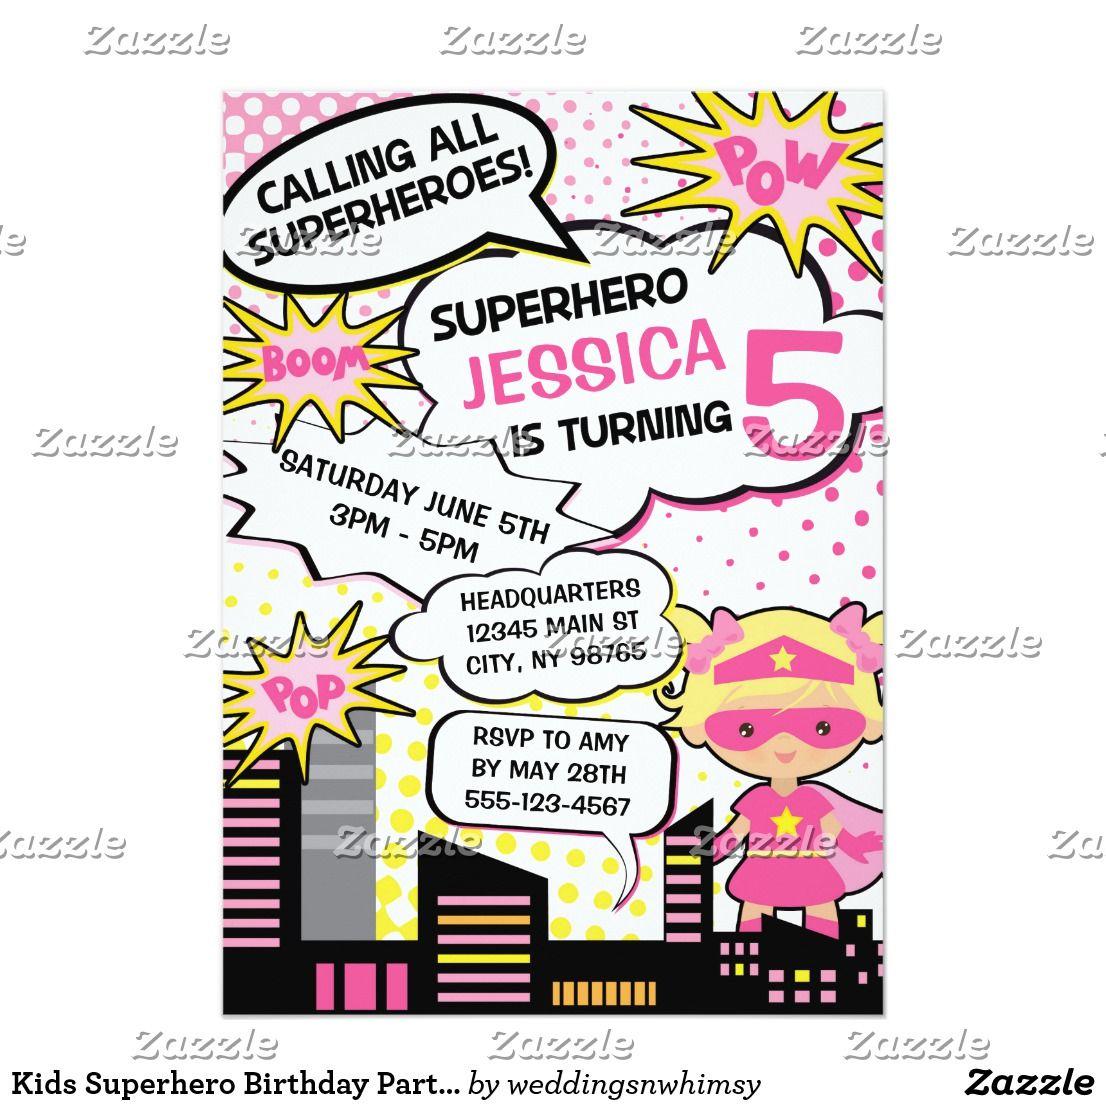 Kids Superhero Birthday Party Invite Girl Hero | Pinterest ...